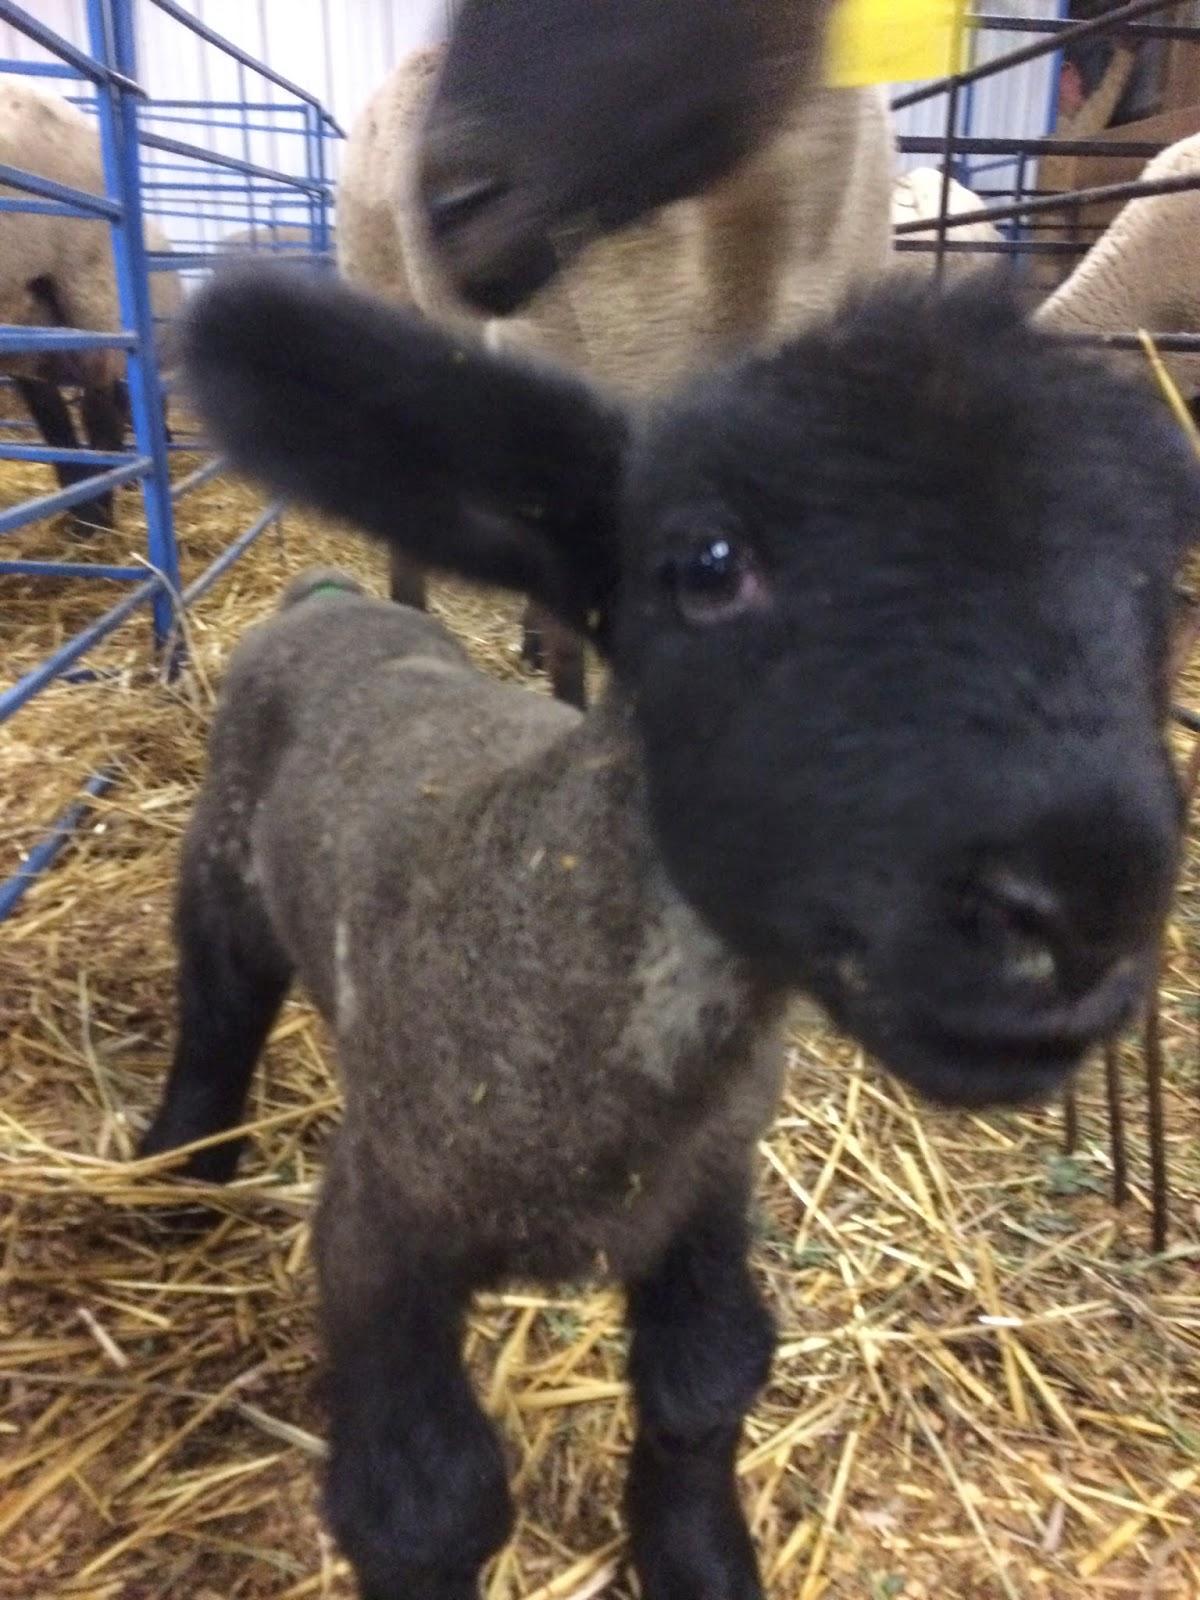 Baby lamb in a lambing jug